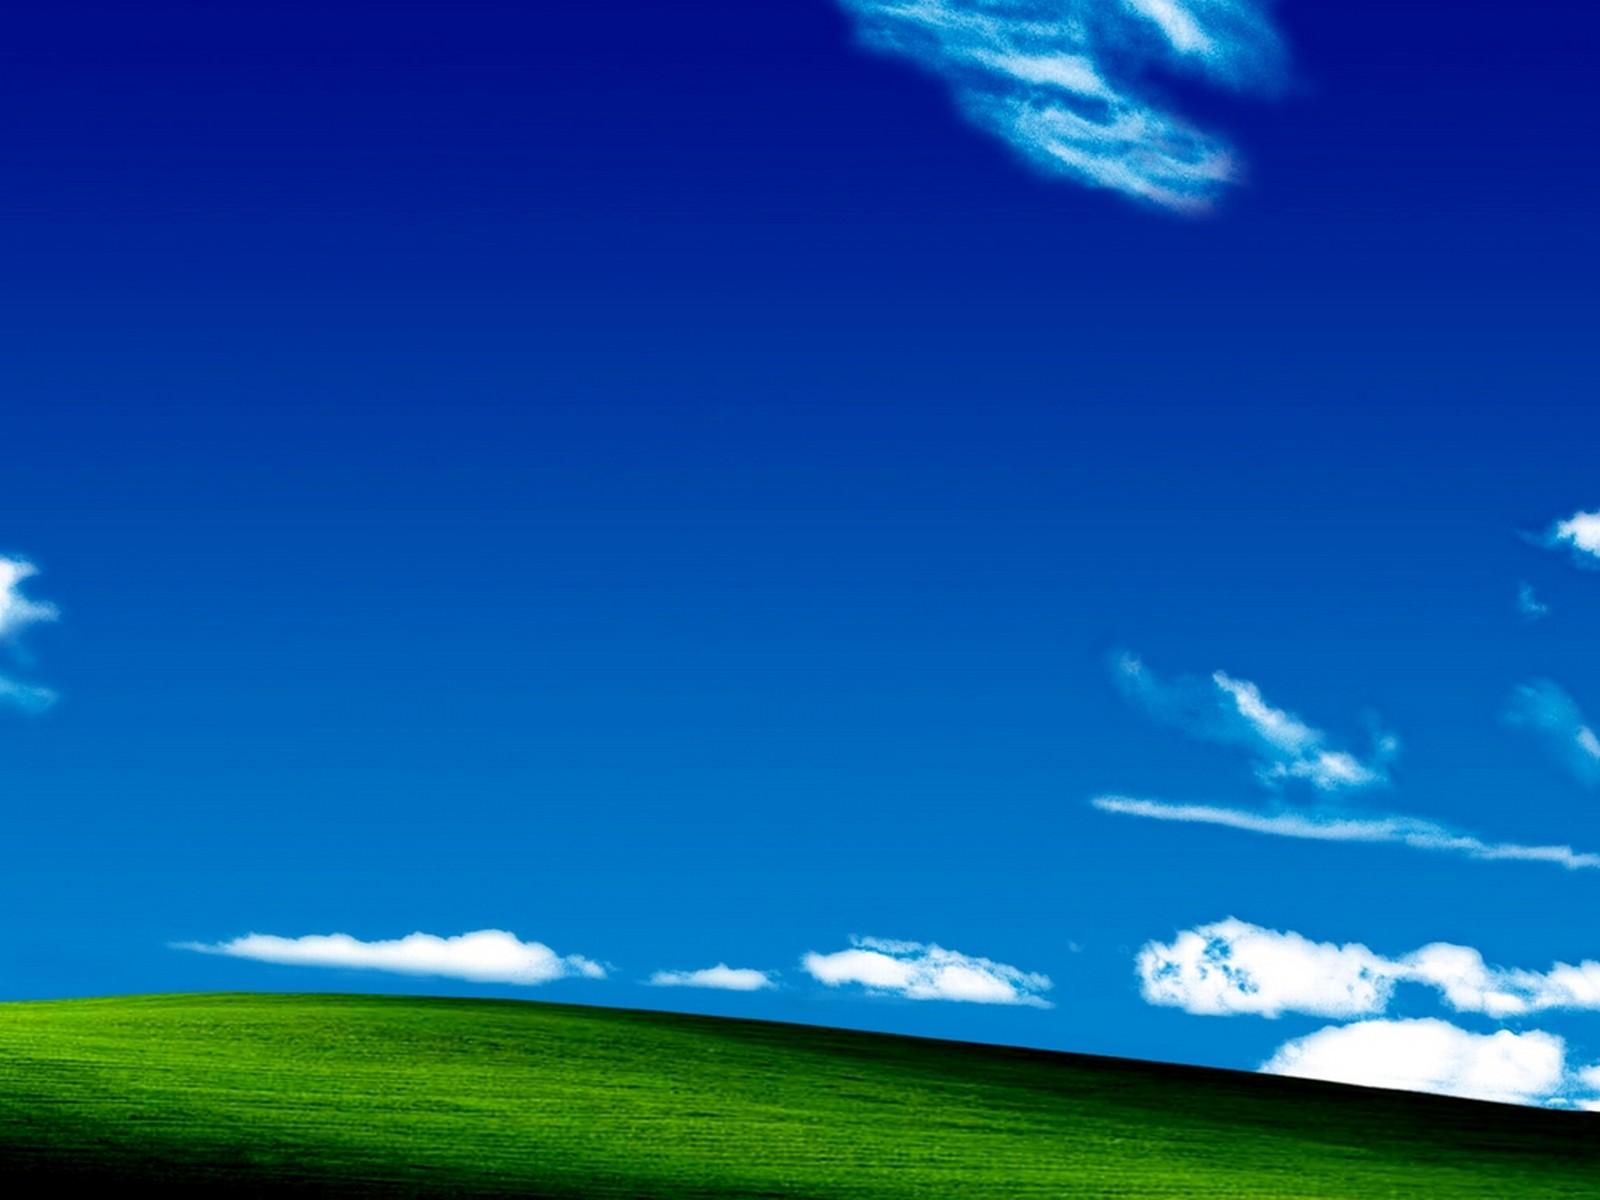 About Genuine Windows